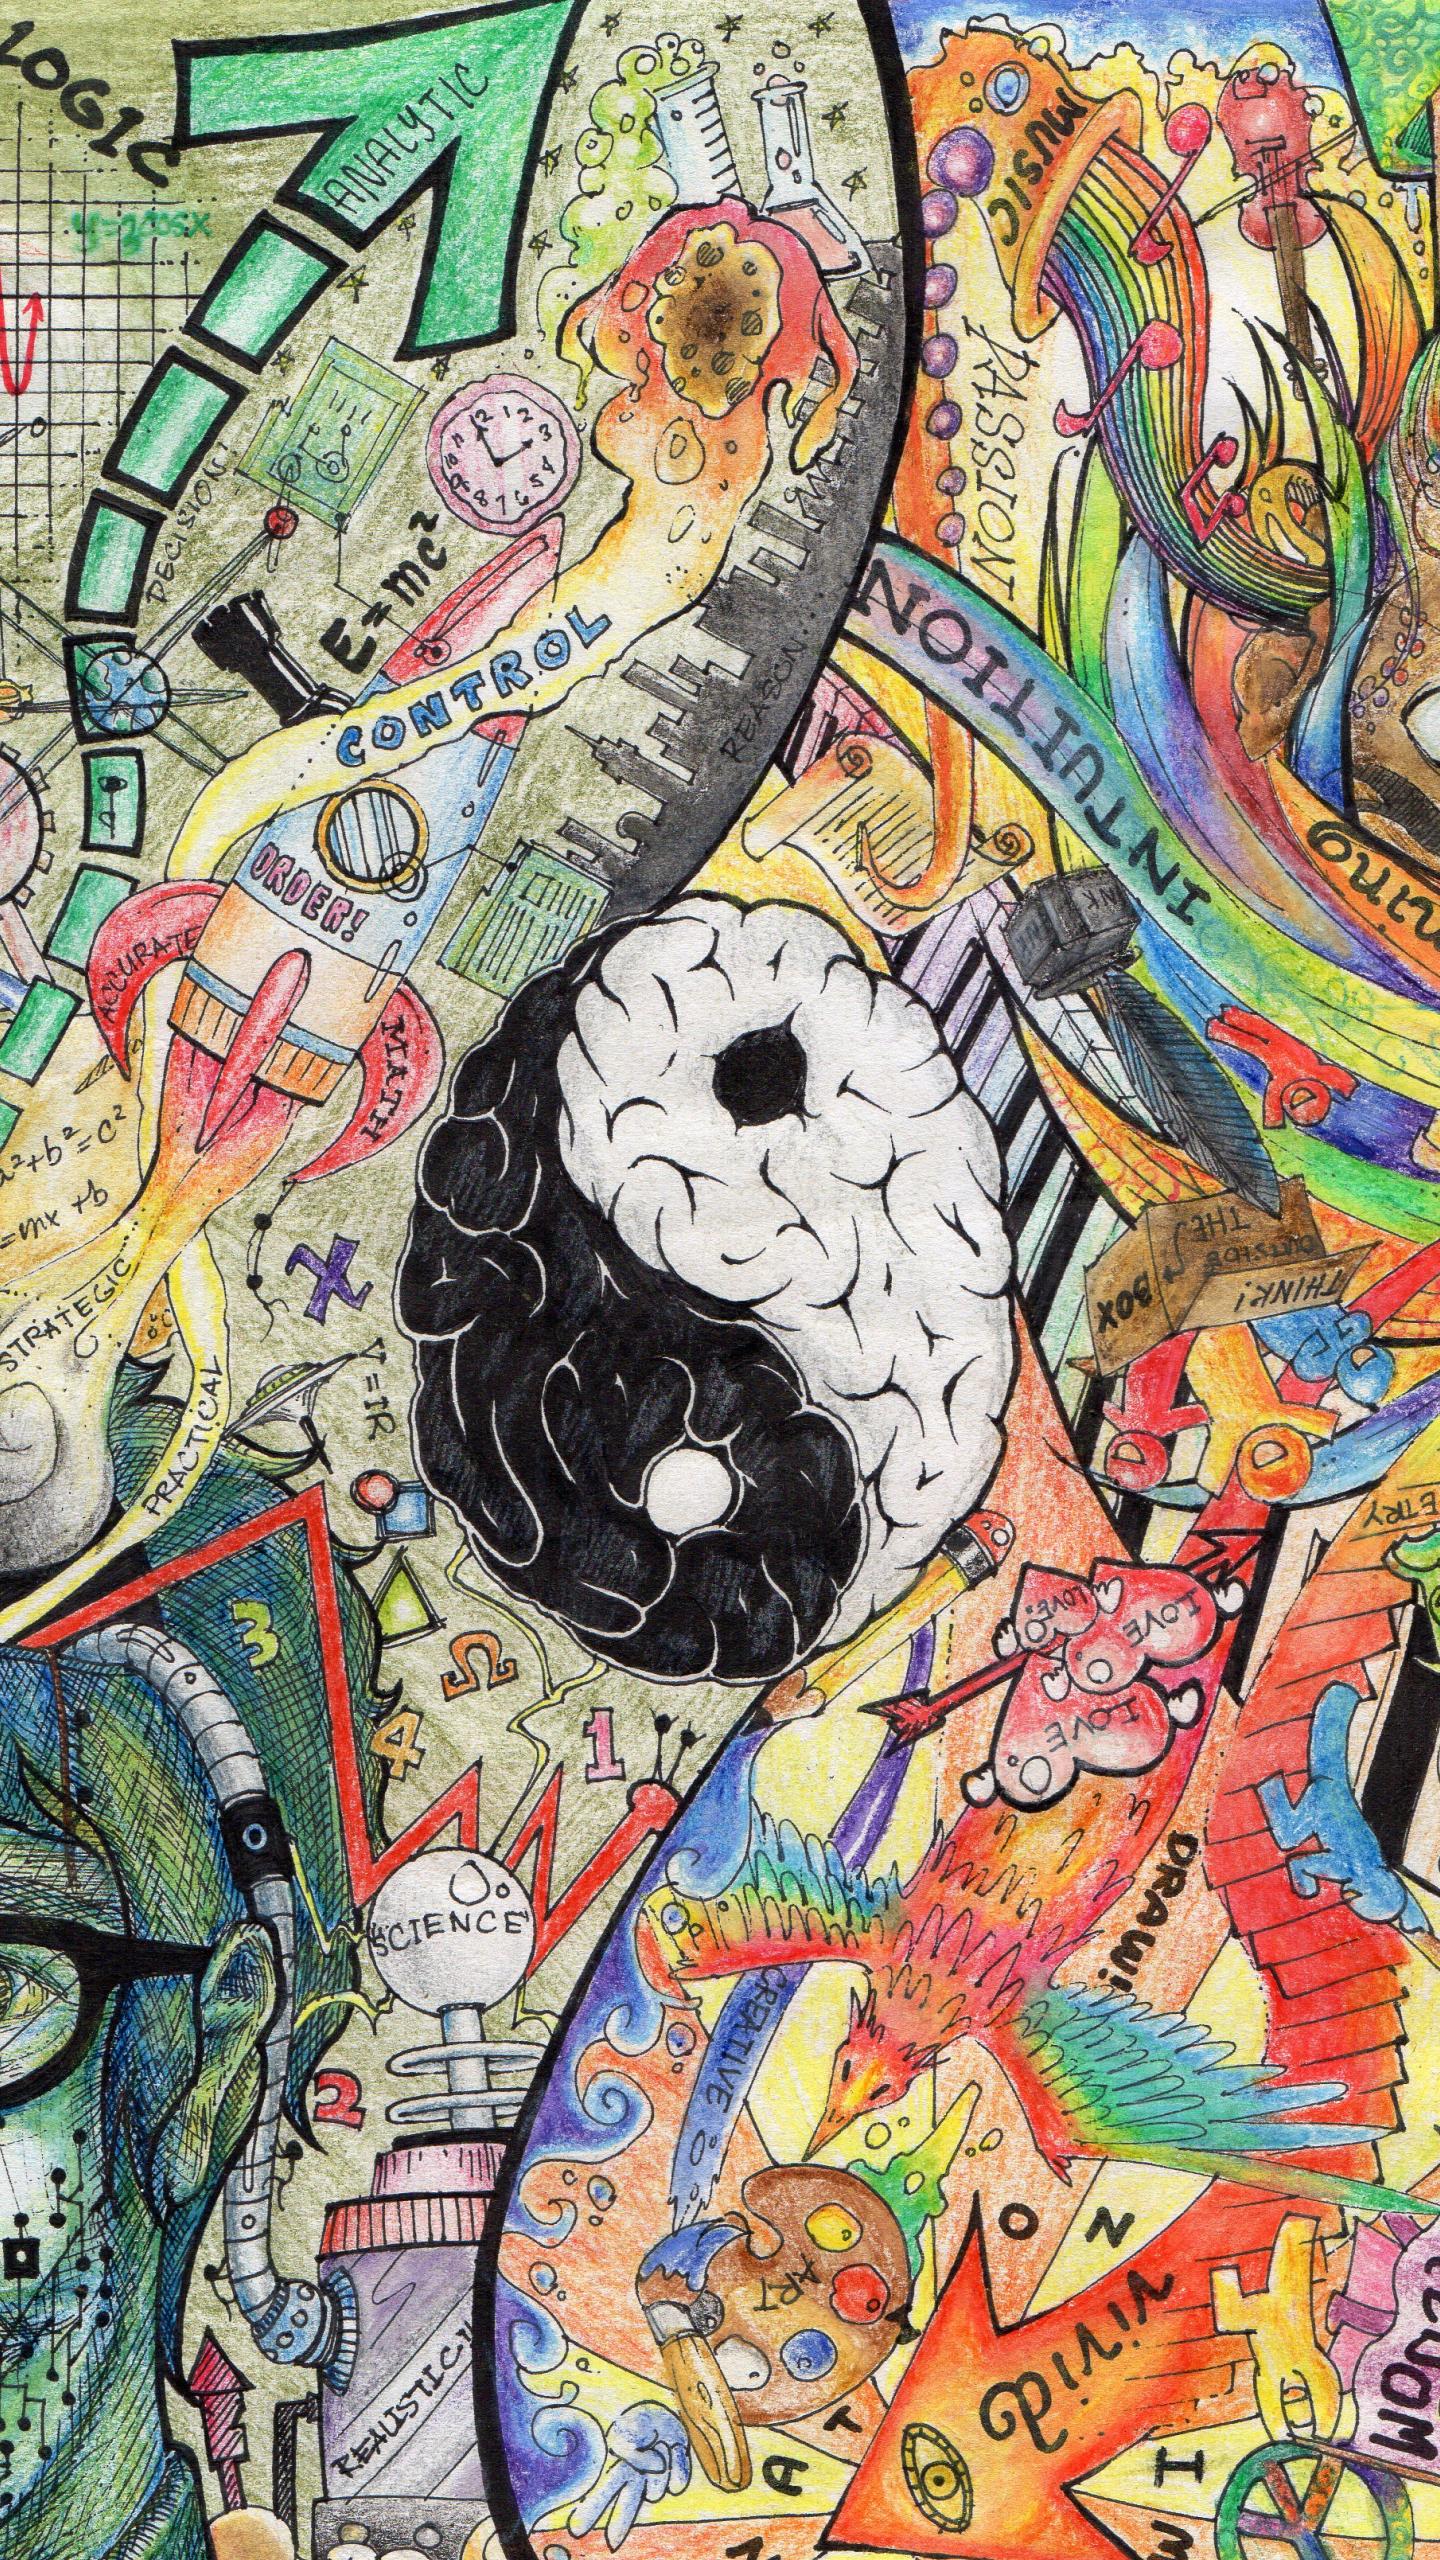 Free Download Left Brain Right Brain Wallpaper 2448x3216